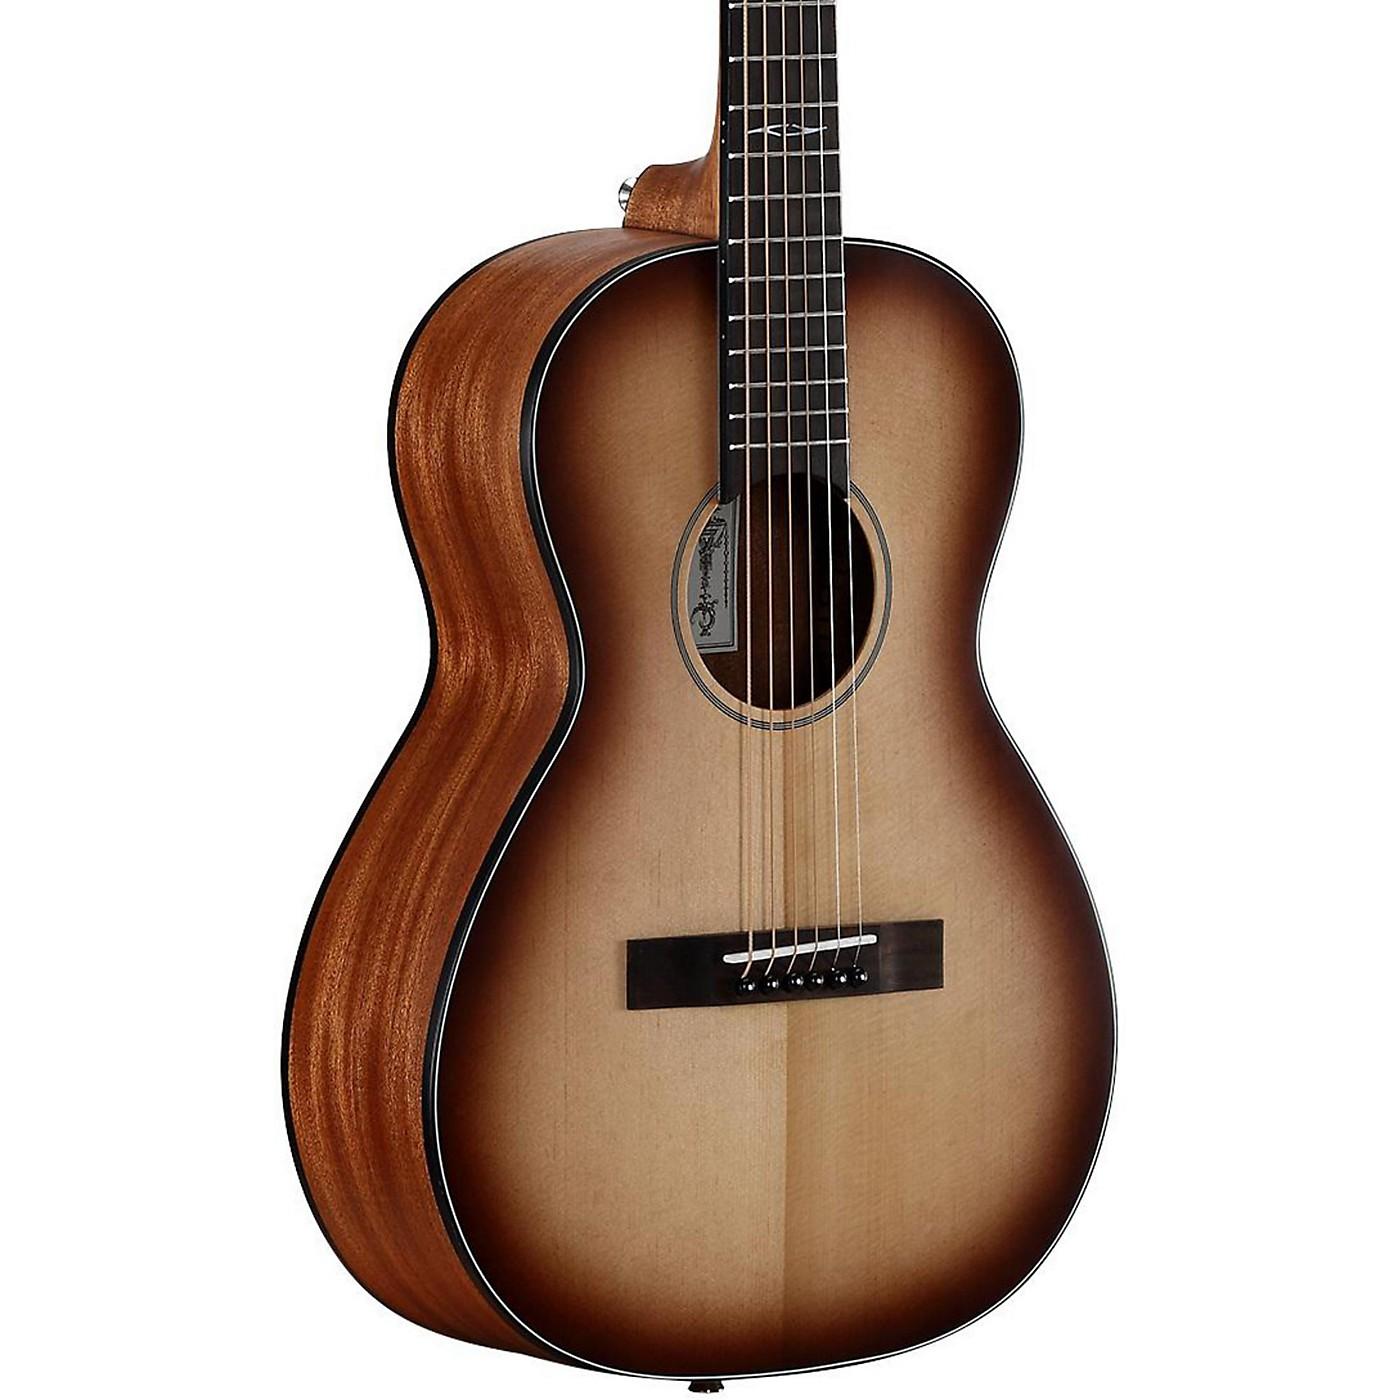 Alvarez Delta DeLite Small Bodied Acoustic Guitar thumbnail